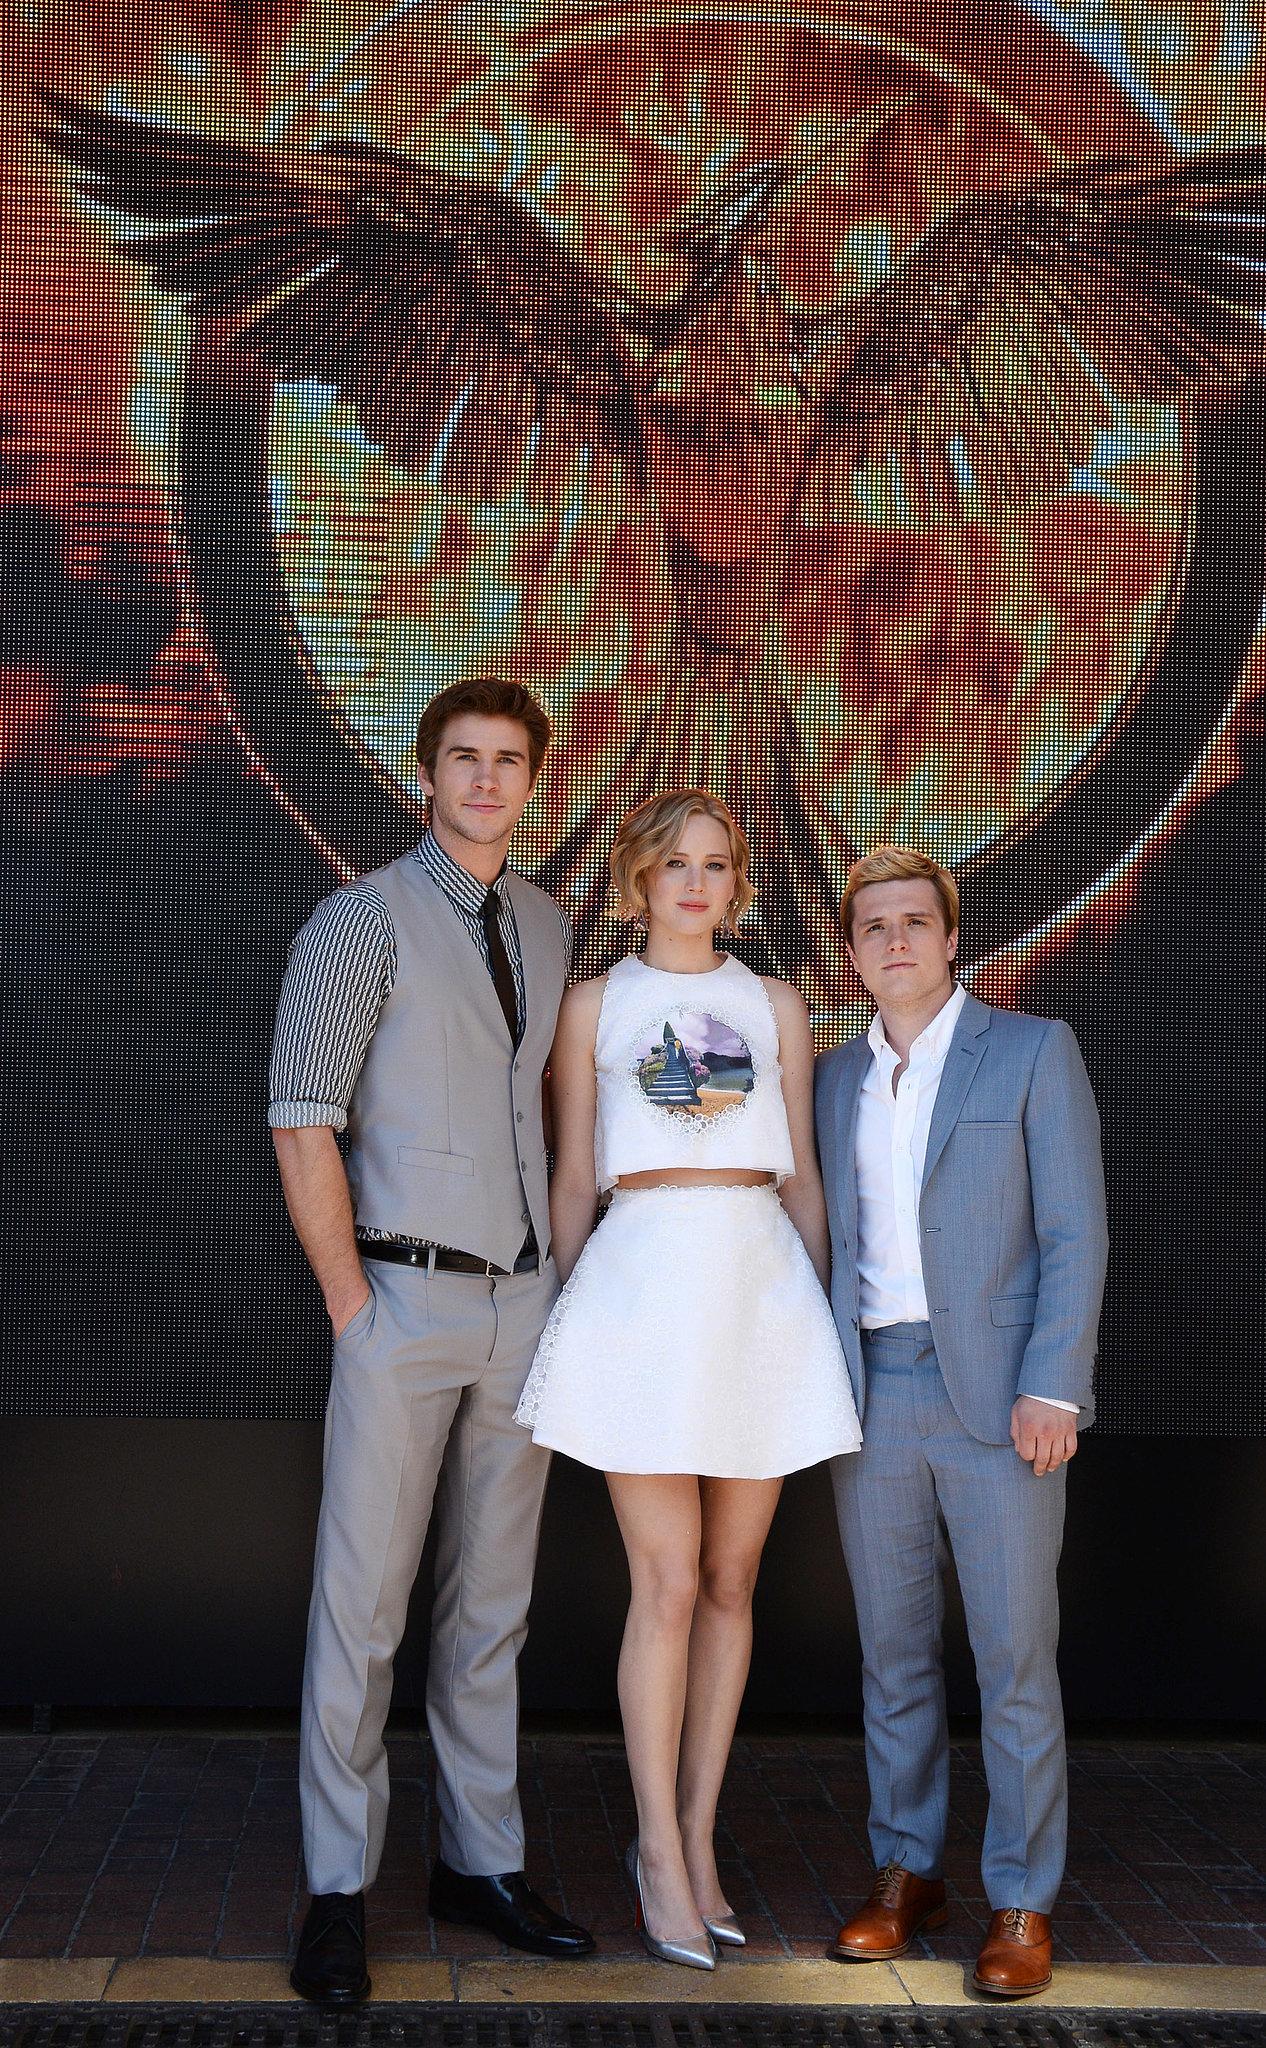 Liam Hemsworth, Jennifer Lawrence, and Josh Hutcherson stood in front of a giant Mockingjay backdrop.